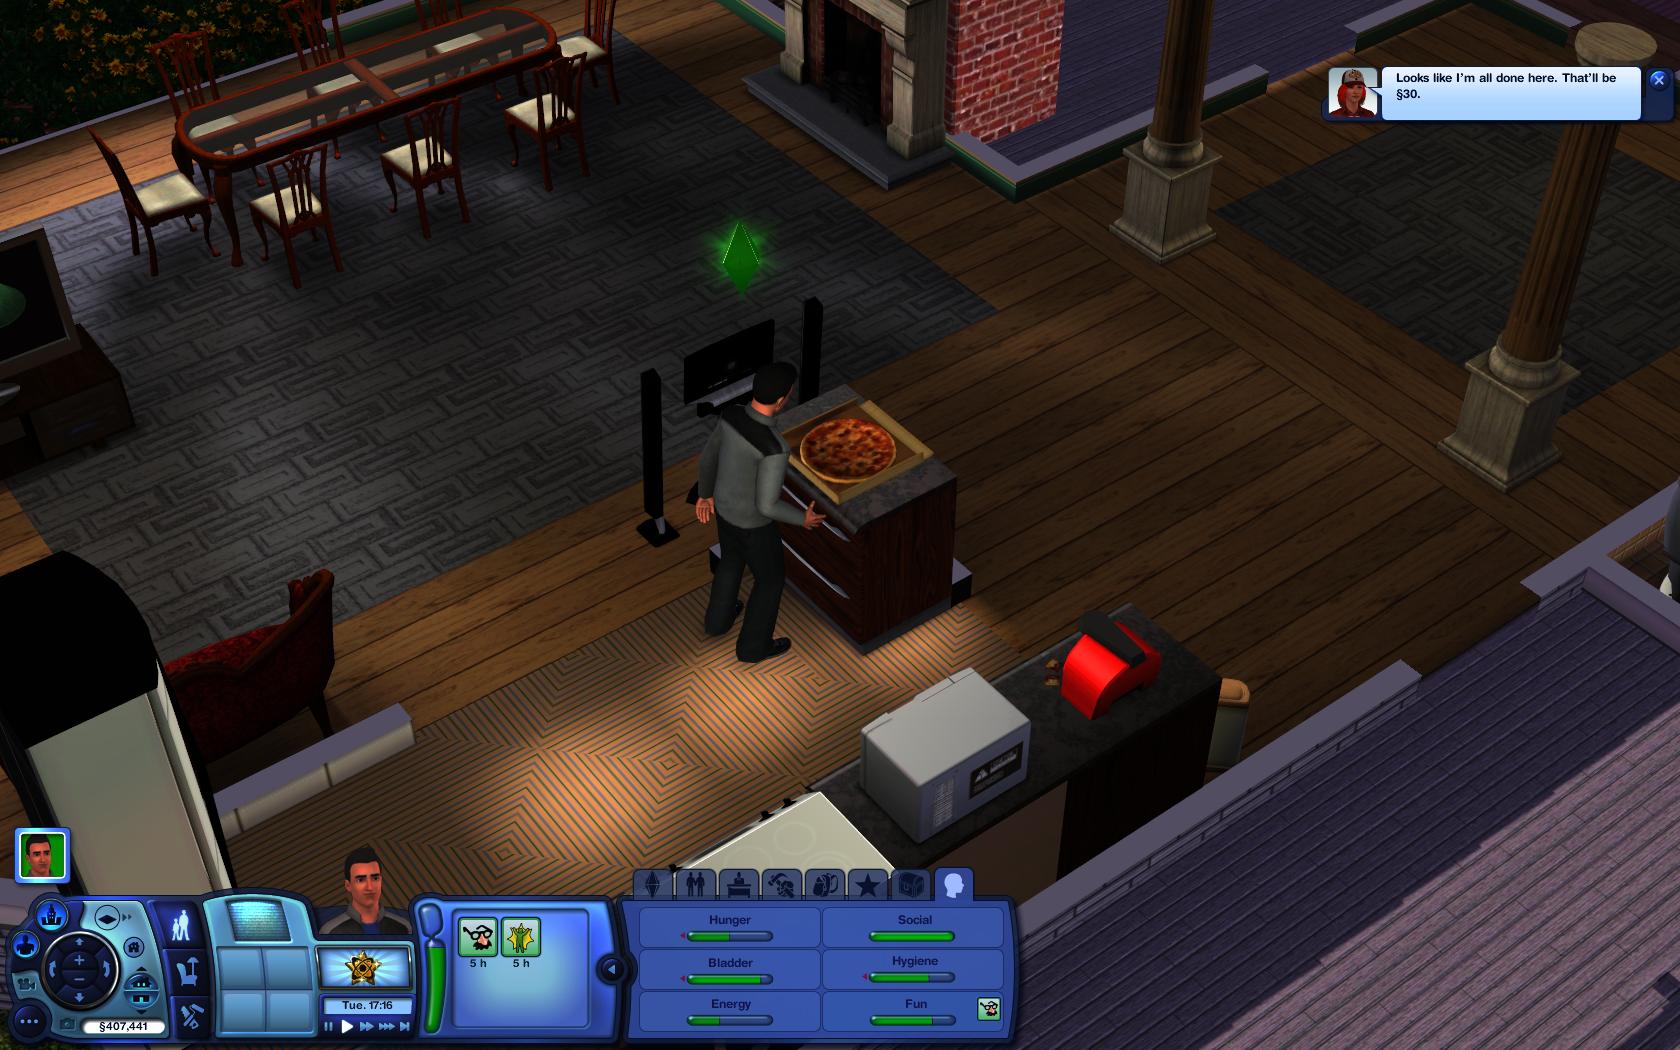 Sims 3: World Adventures announced